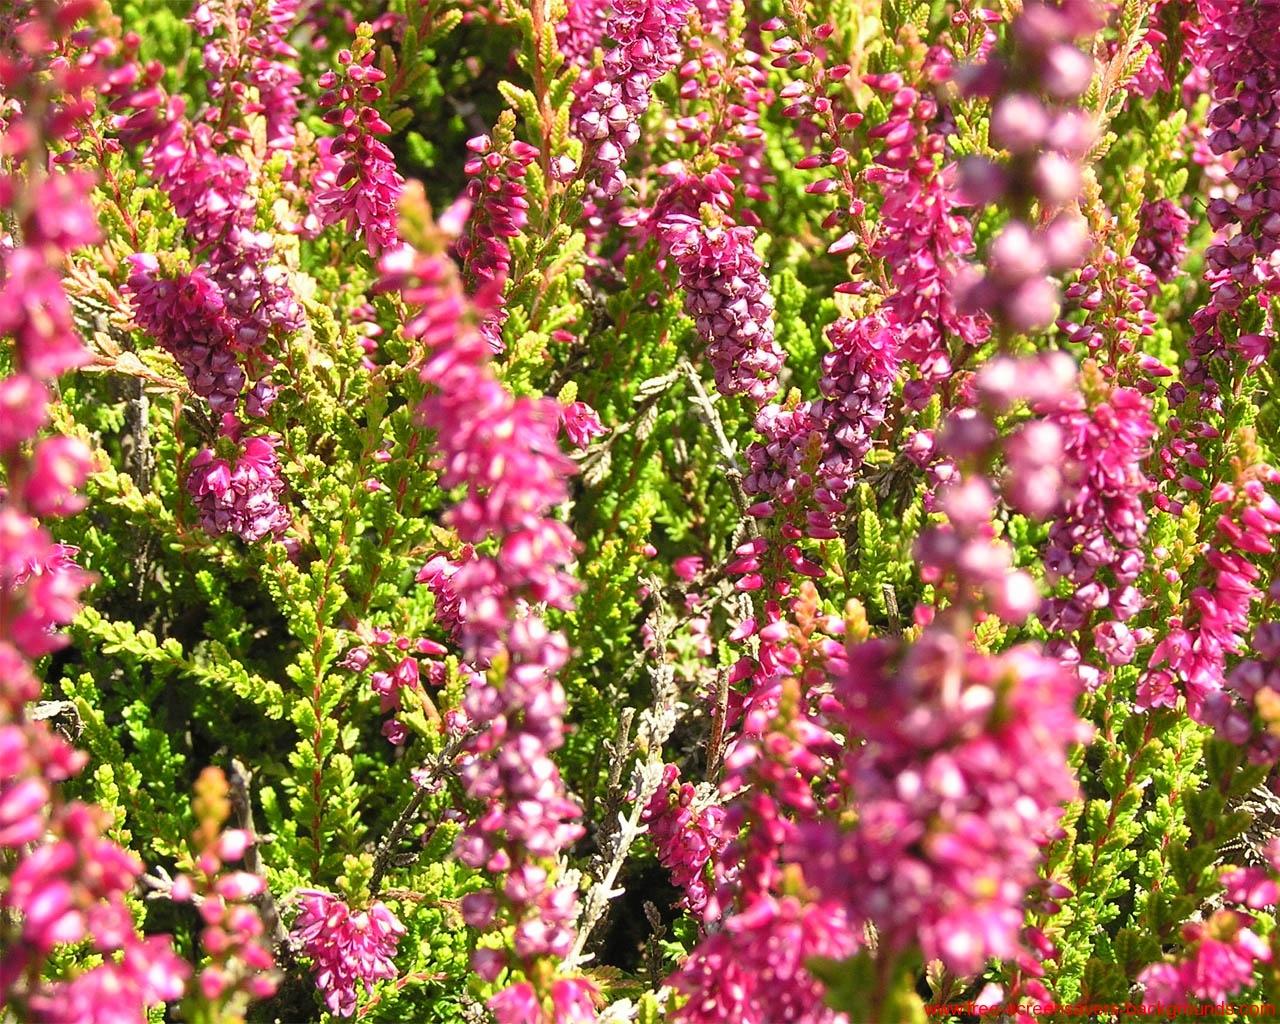 spring flowers screensavers - photo #22